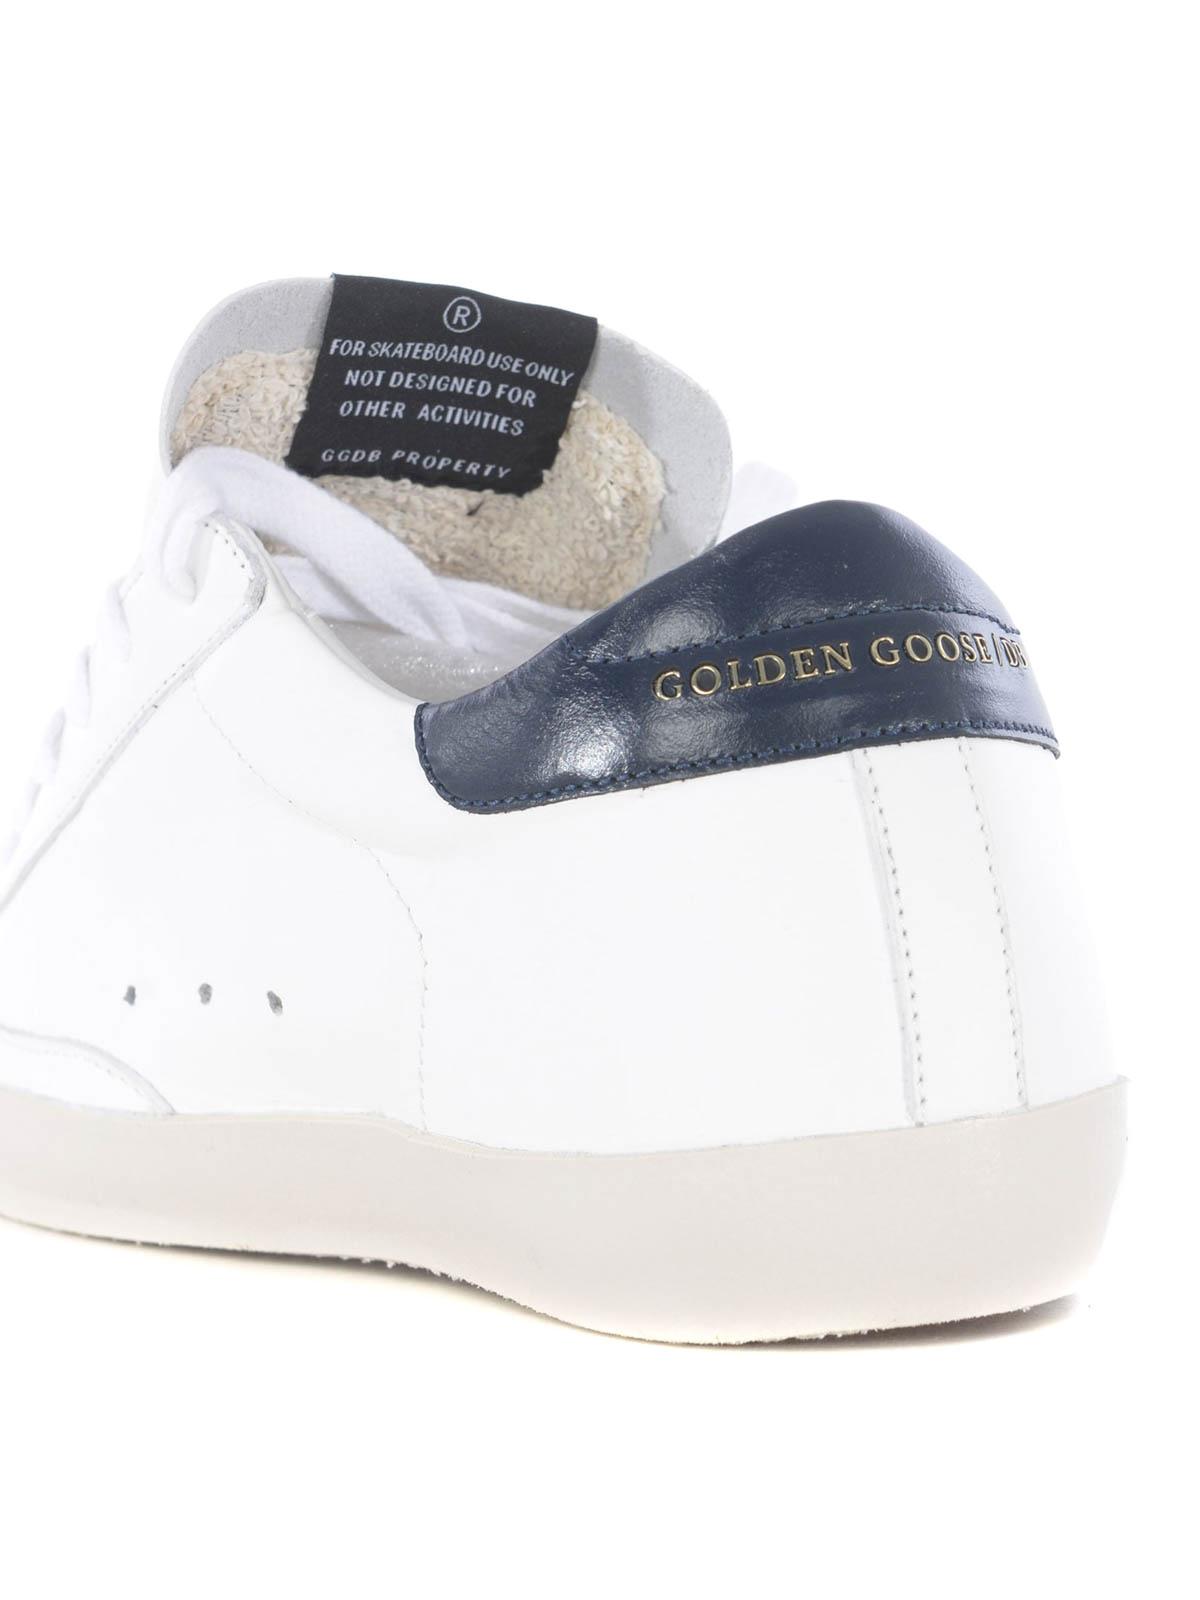 golden goose for skateboard use only